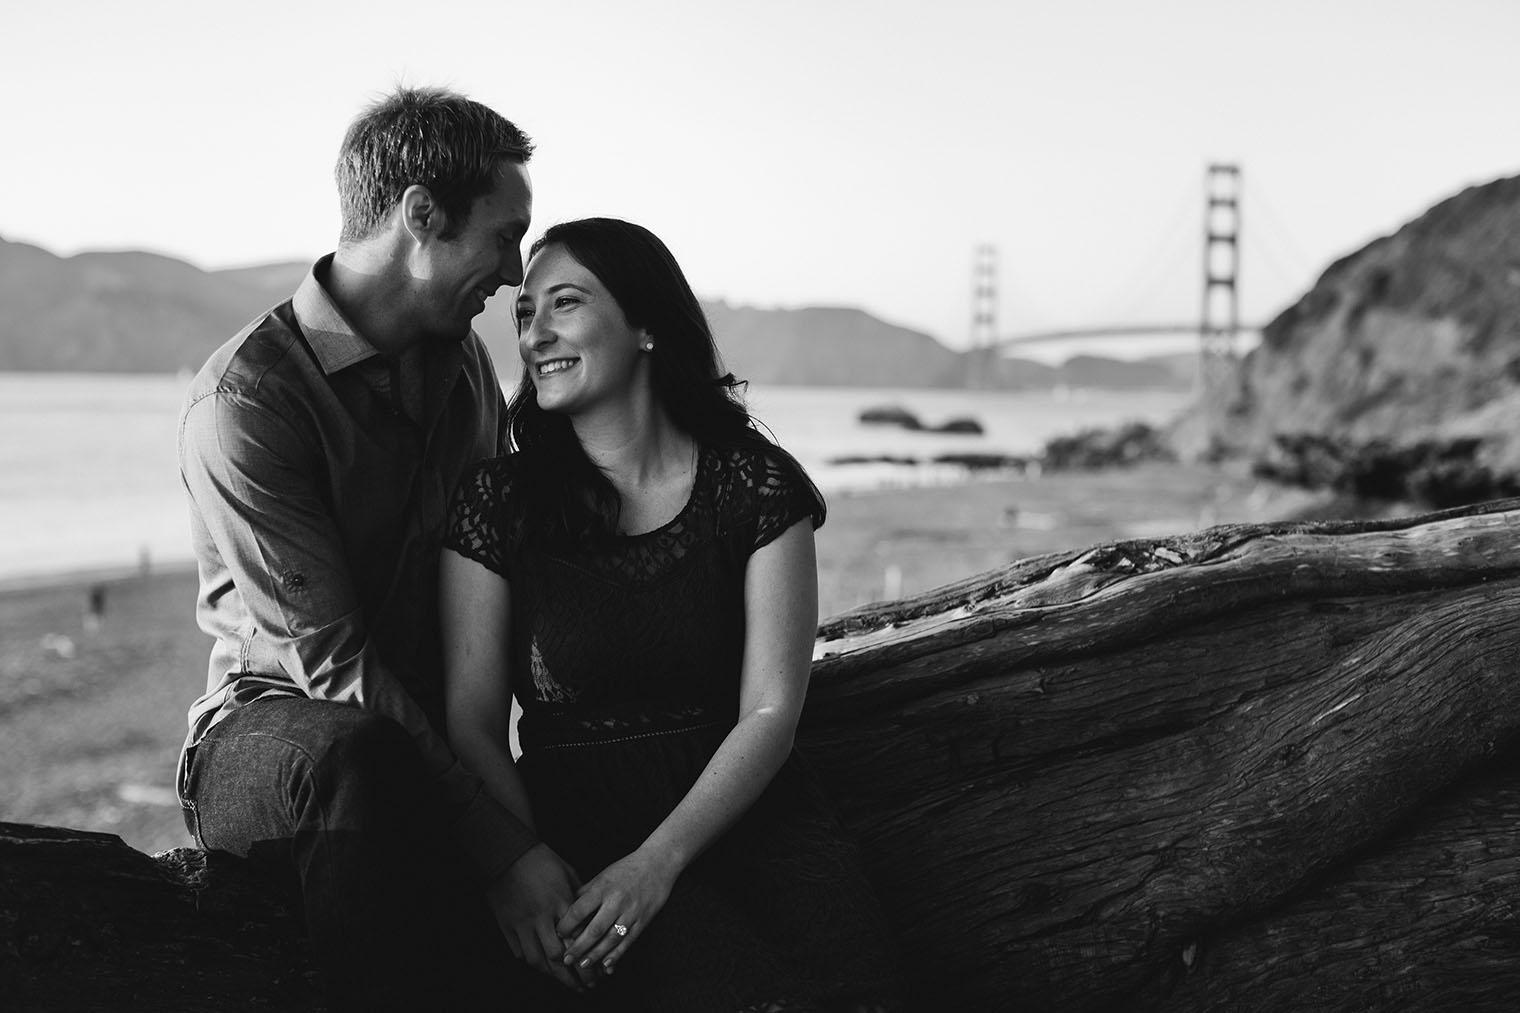 San Francisco Engagement Photos at Baker Beach